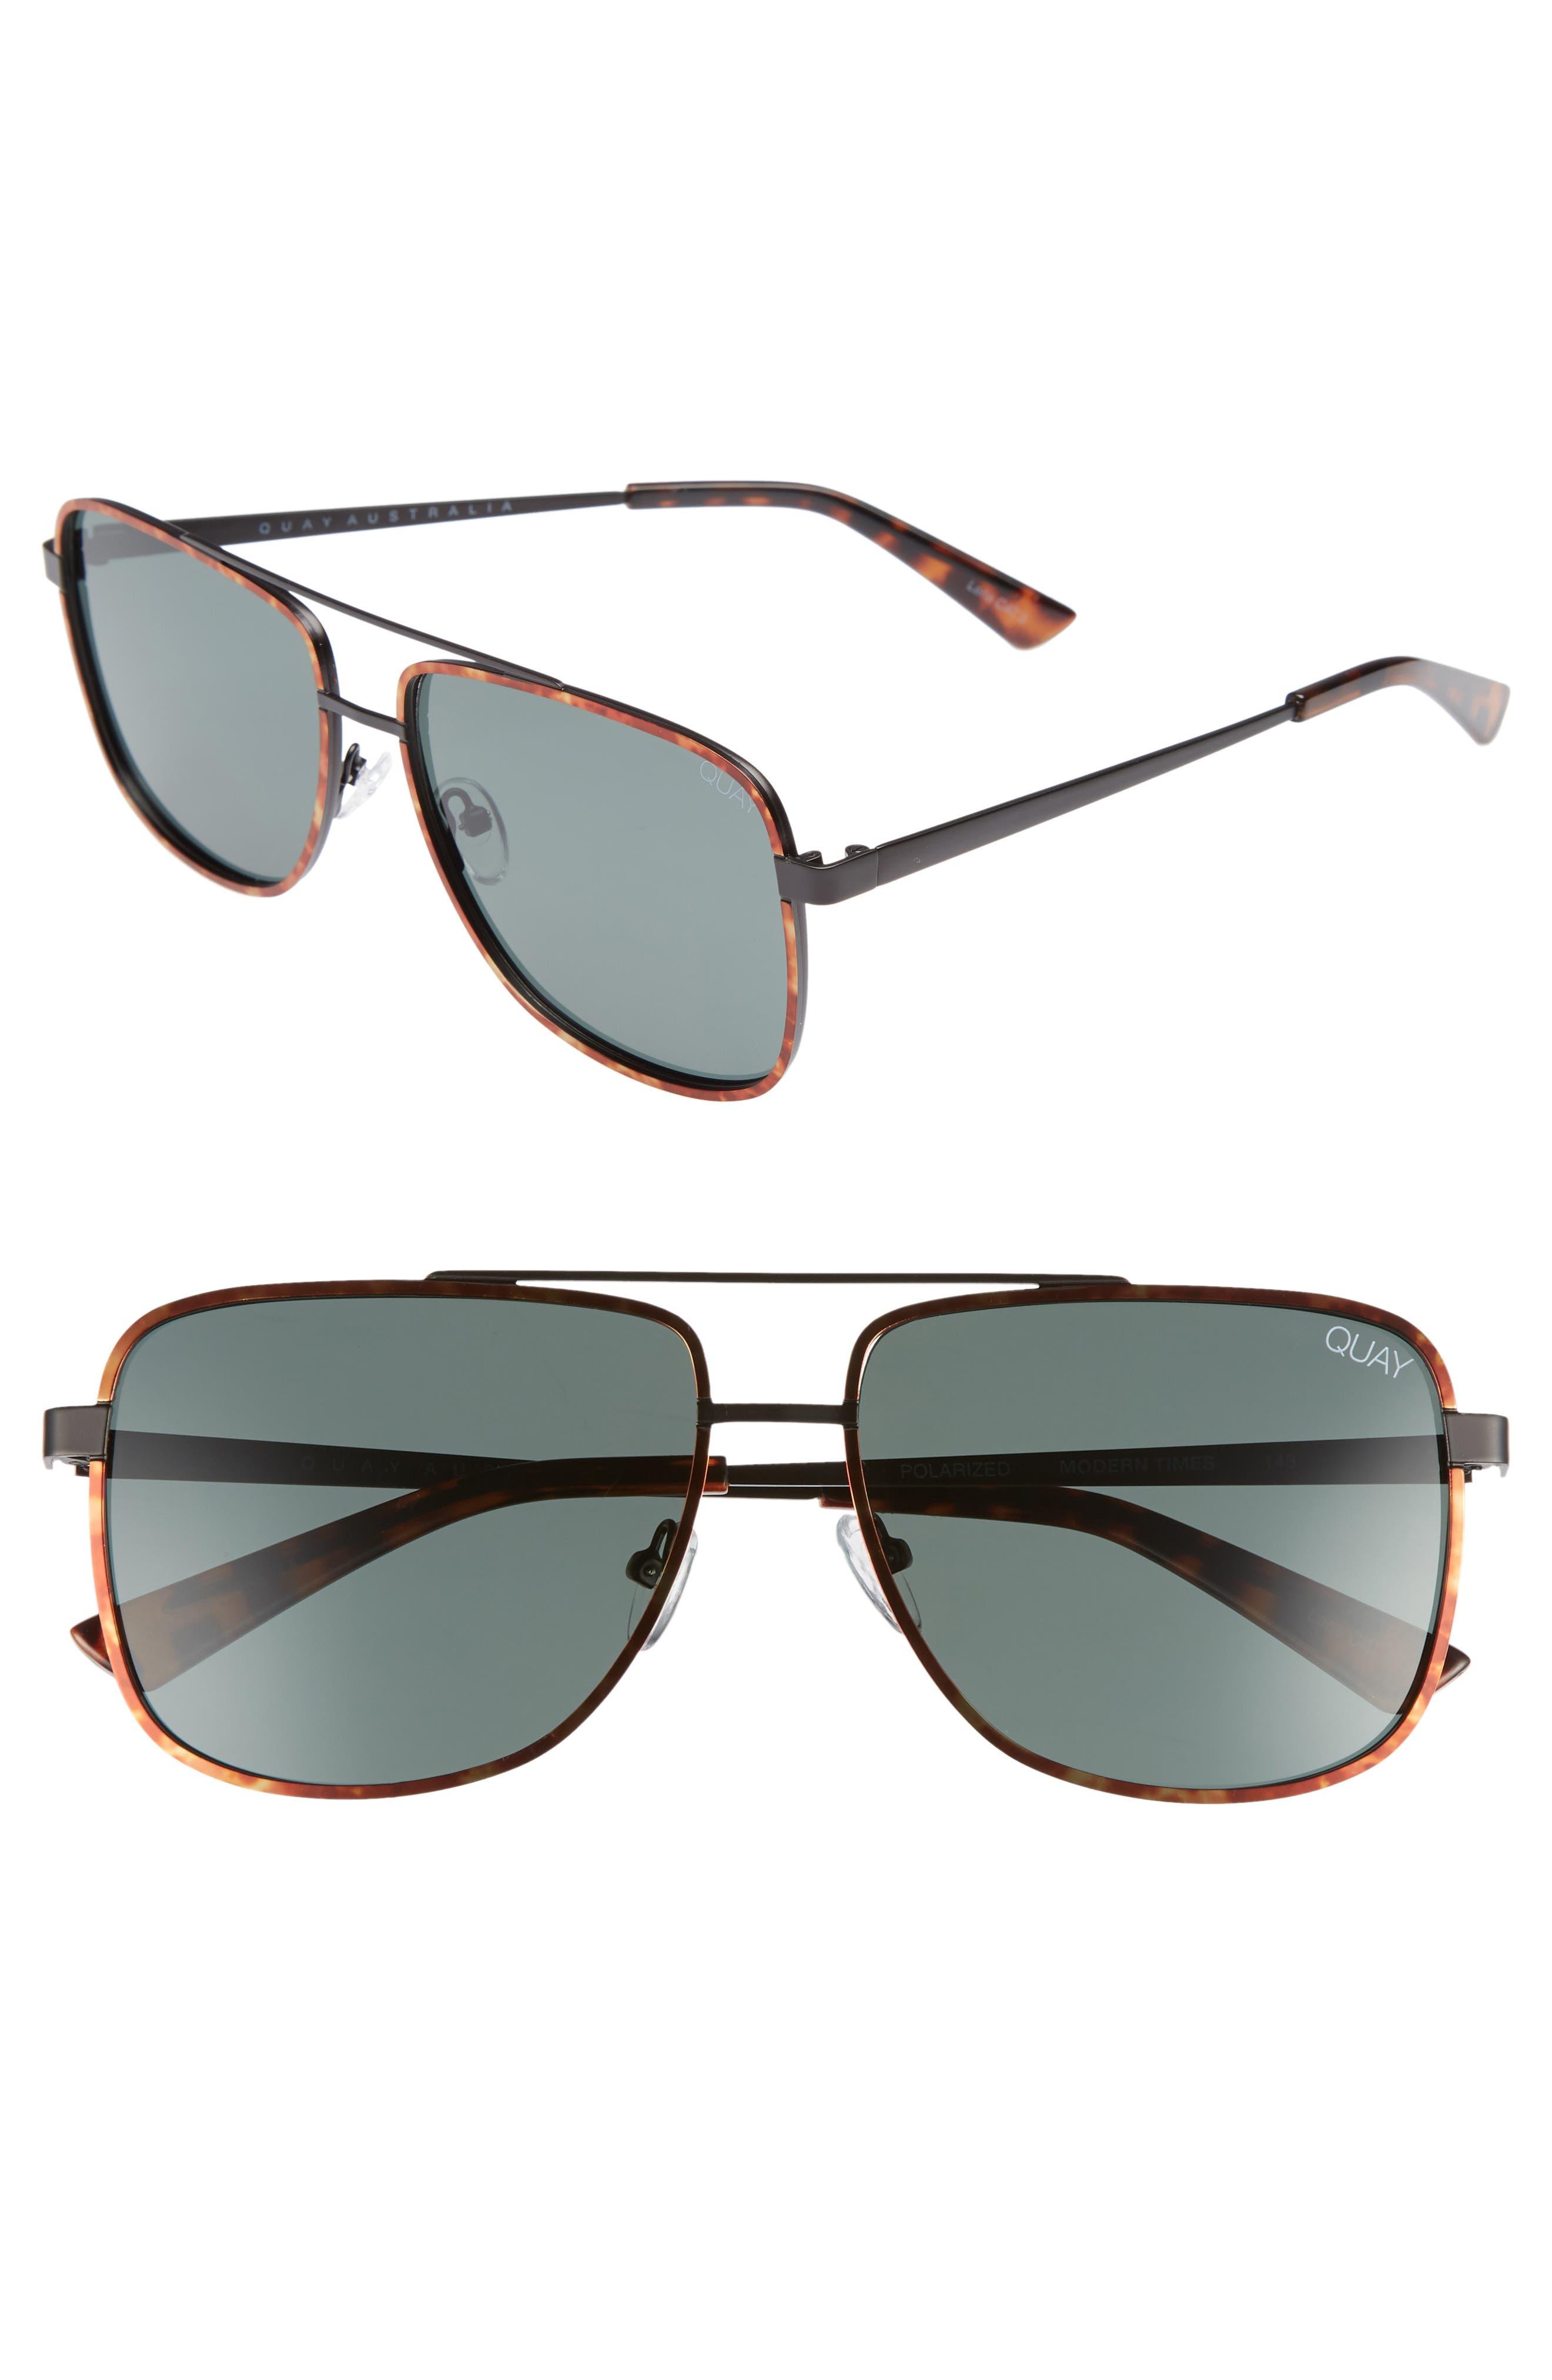 Modern Times 57mm Polarized Aviator Sunglasses,                         Main,                         color, Tort / Green Lens